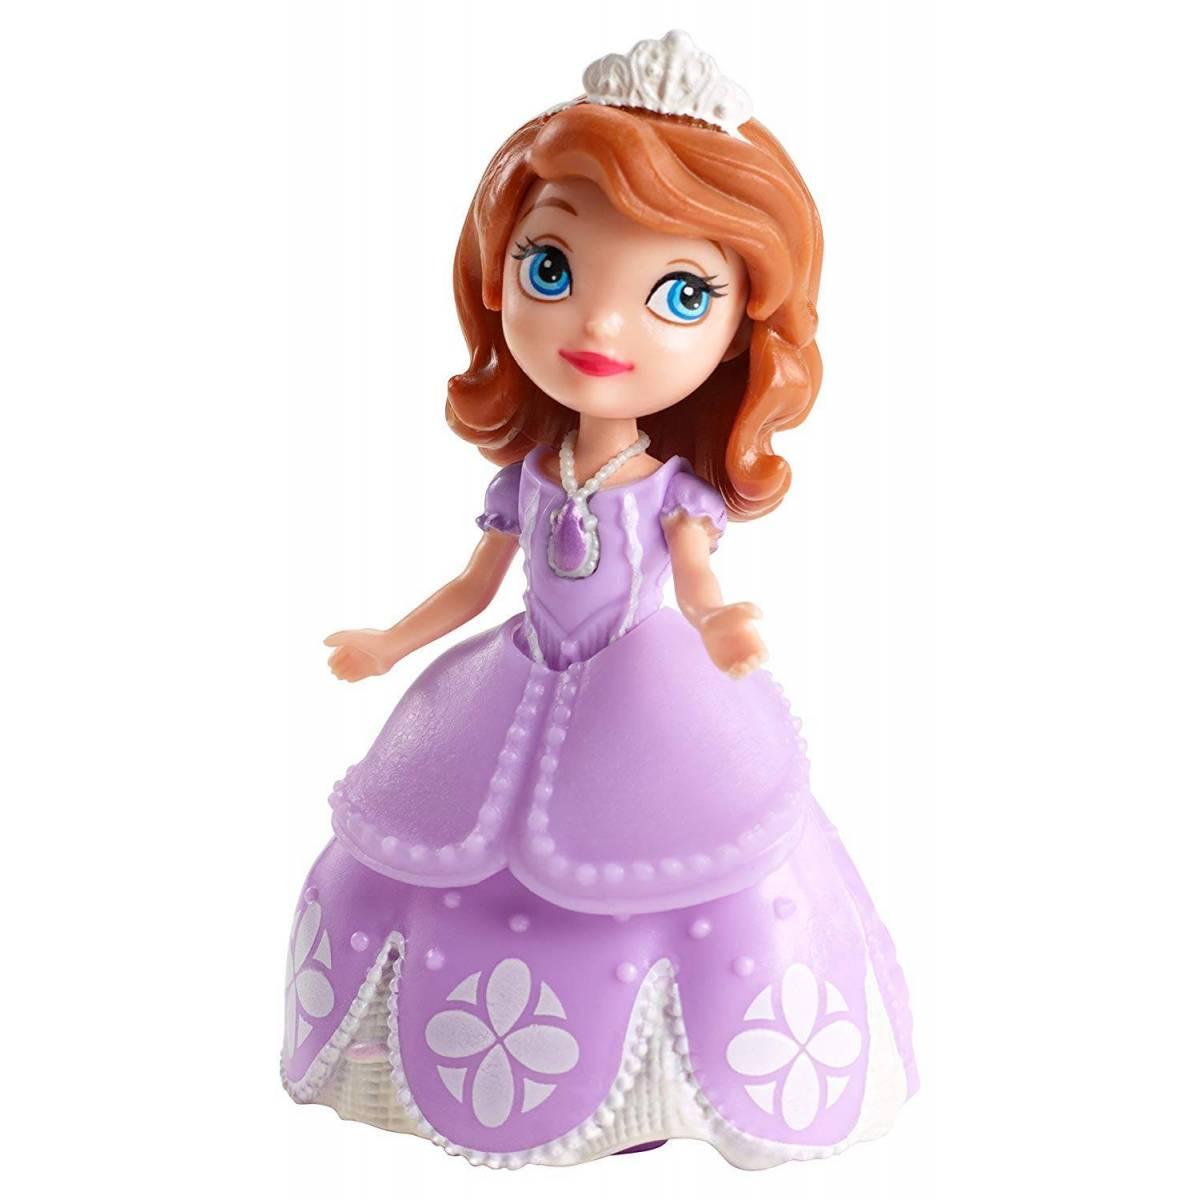 Disney - Mini-Poupée Princesse Sofia - 9 cm